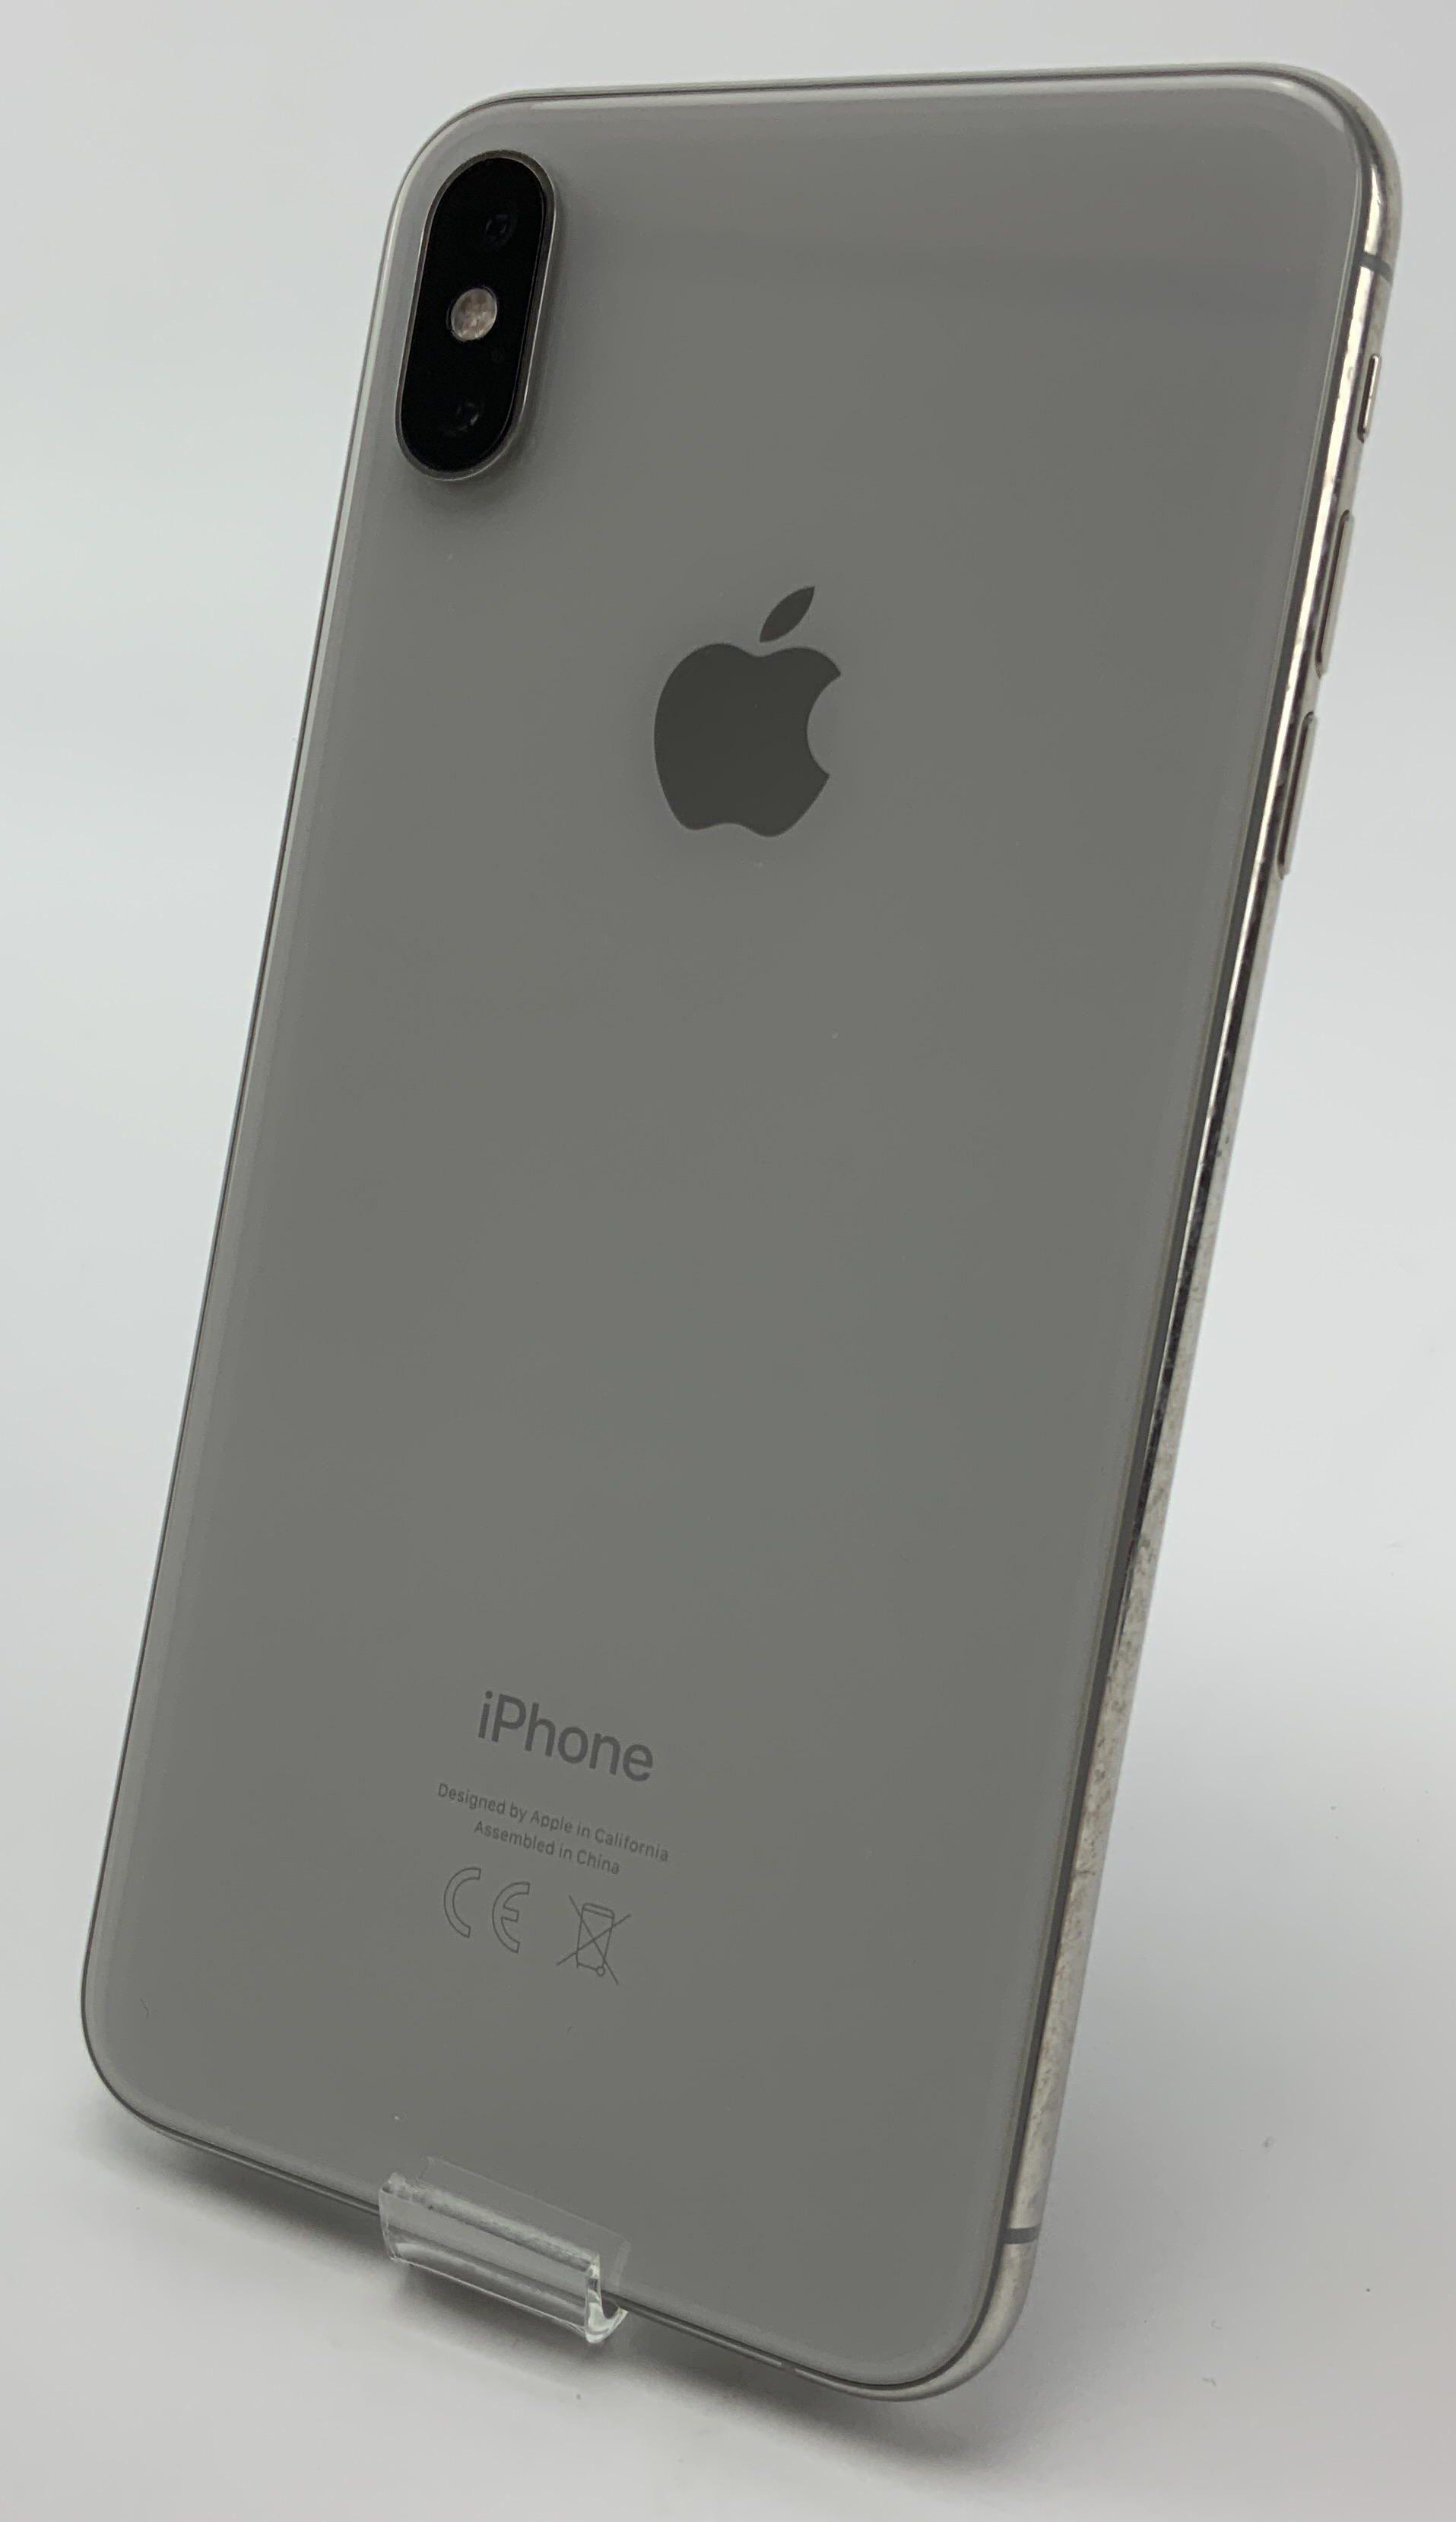 iPhone XS Max 64GB, 64GB, Silver, immagine 2